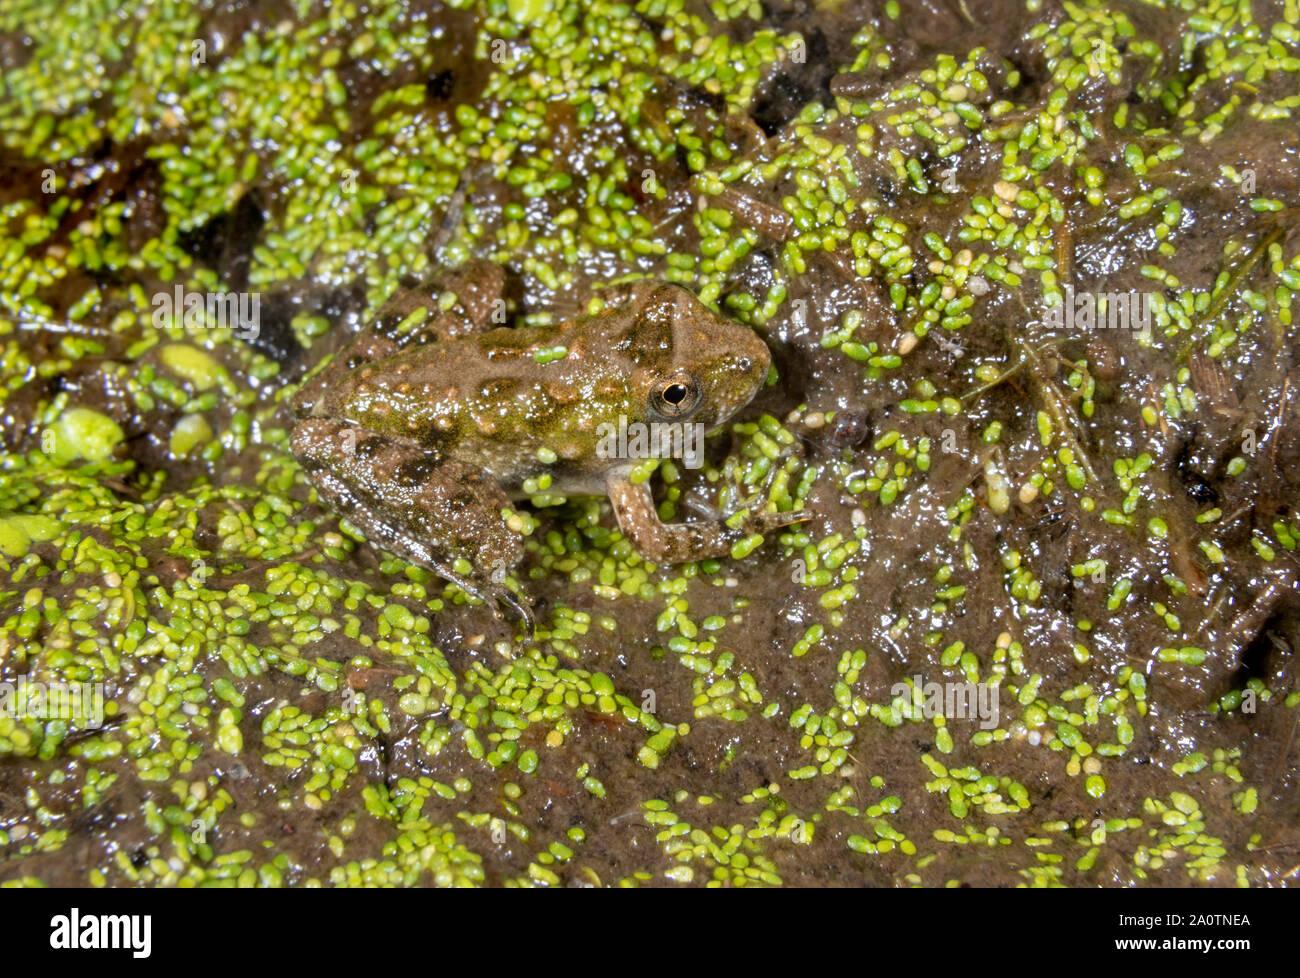 Blanchard's Cricket sapo (Acris blanchardi) camuflar al borde de bosques pantanosos, Iowa, EE.UU. Foto de stock